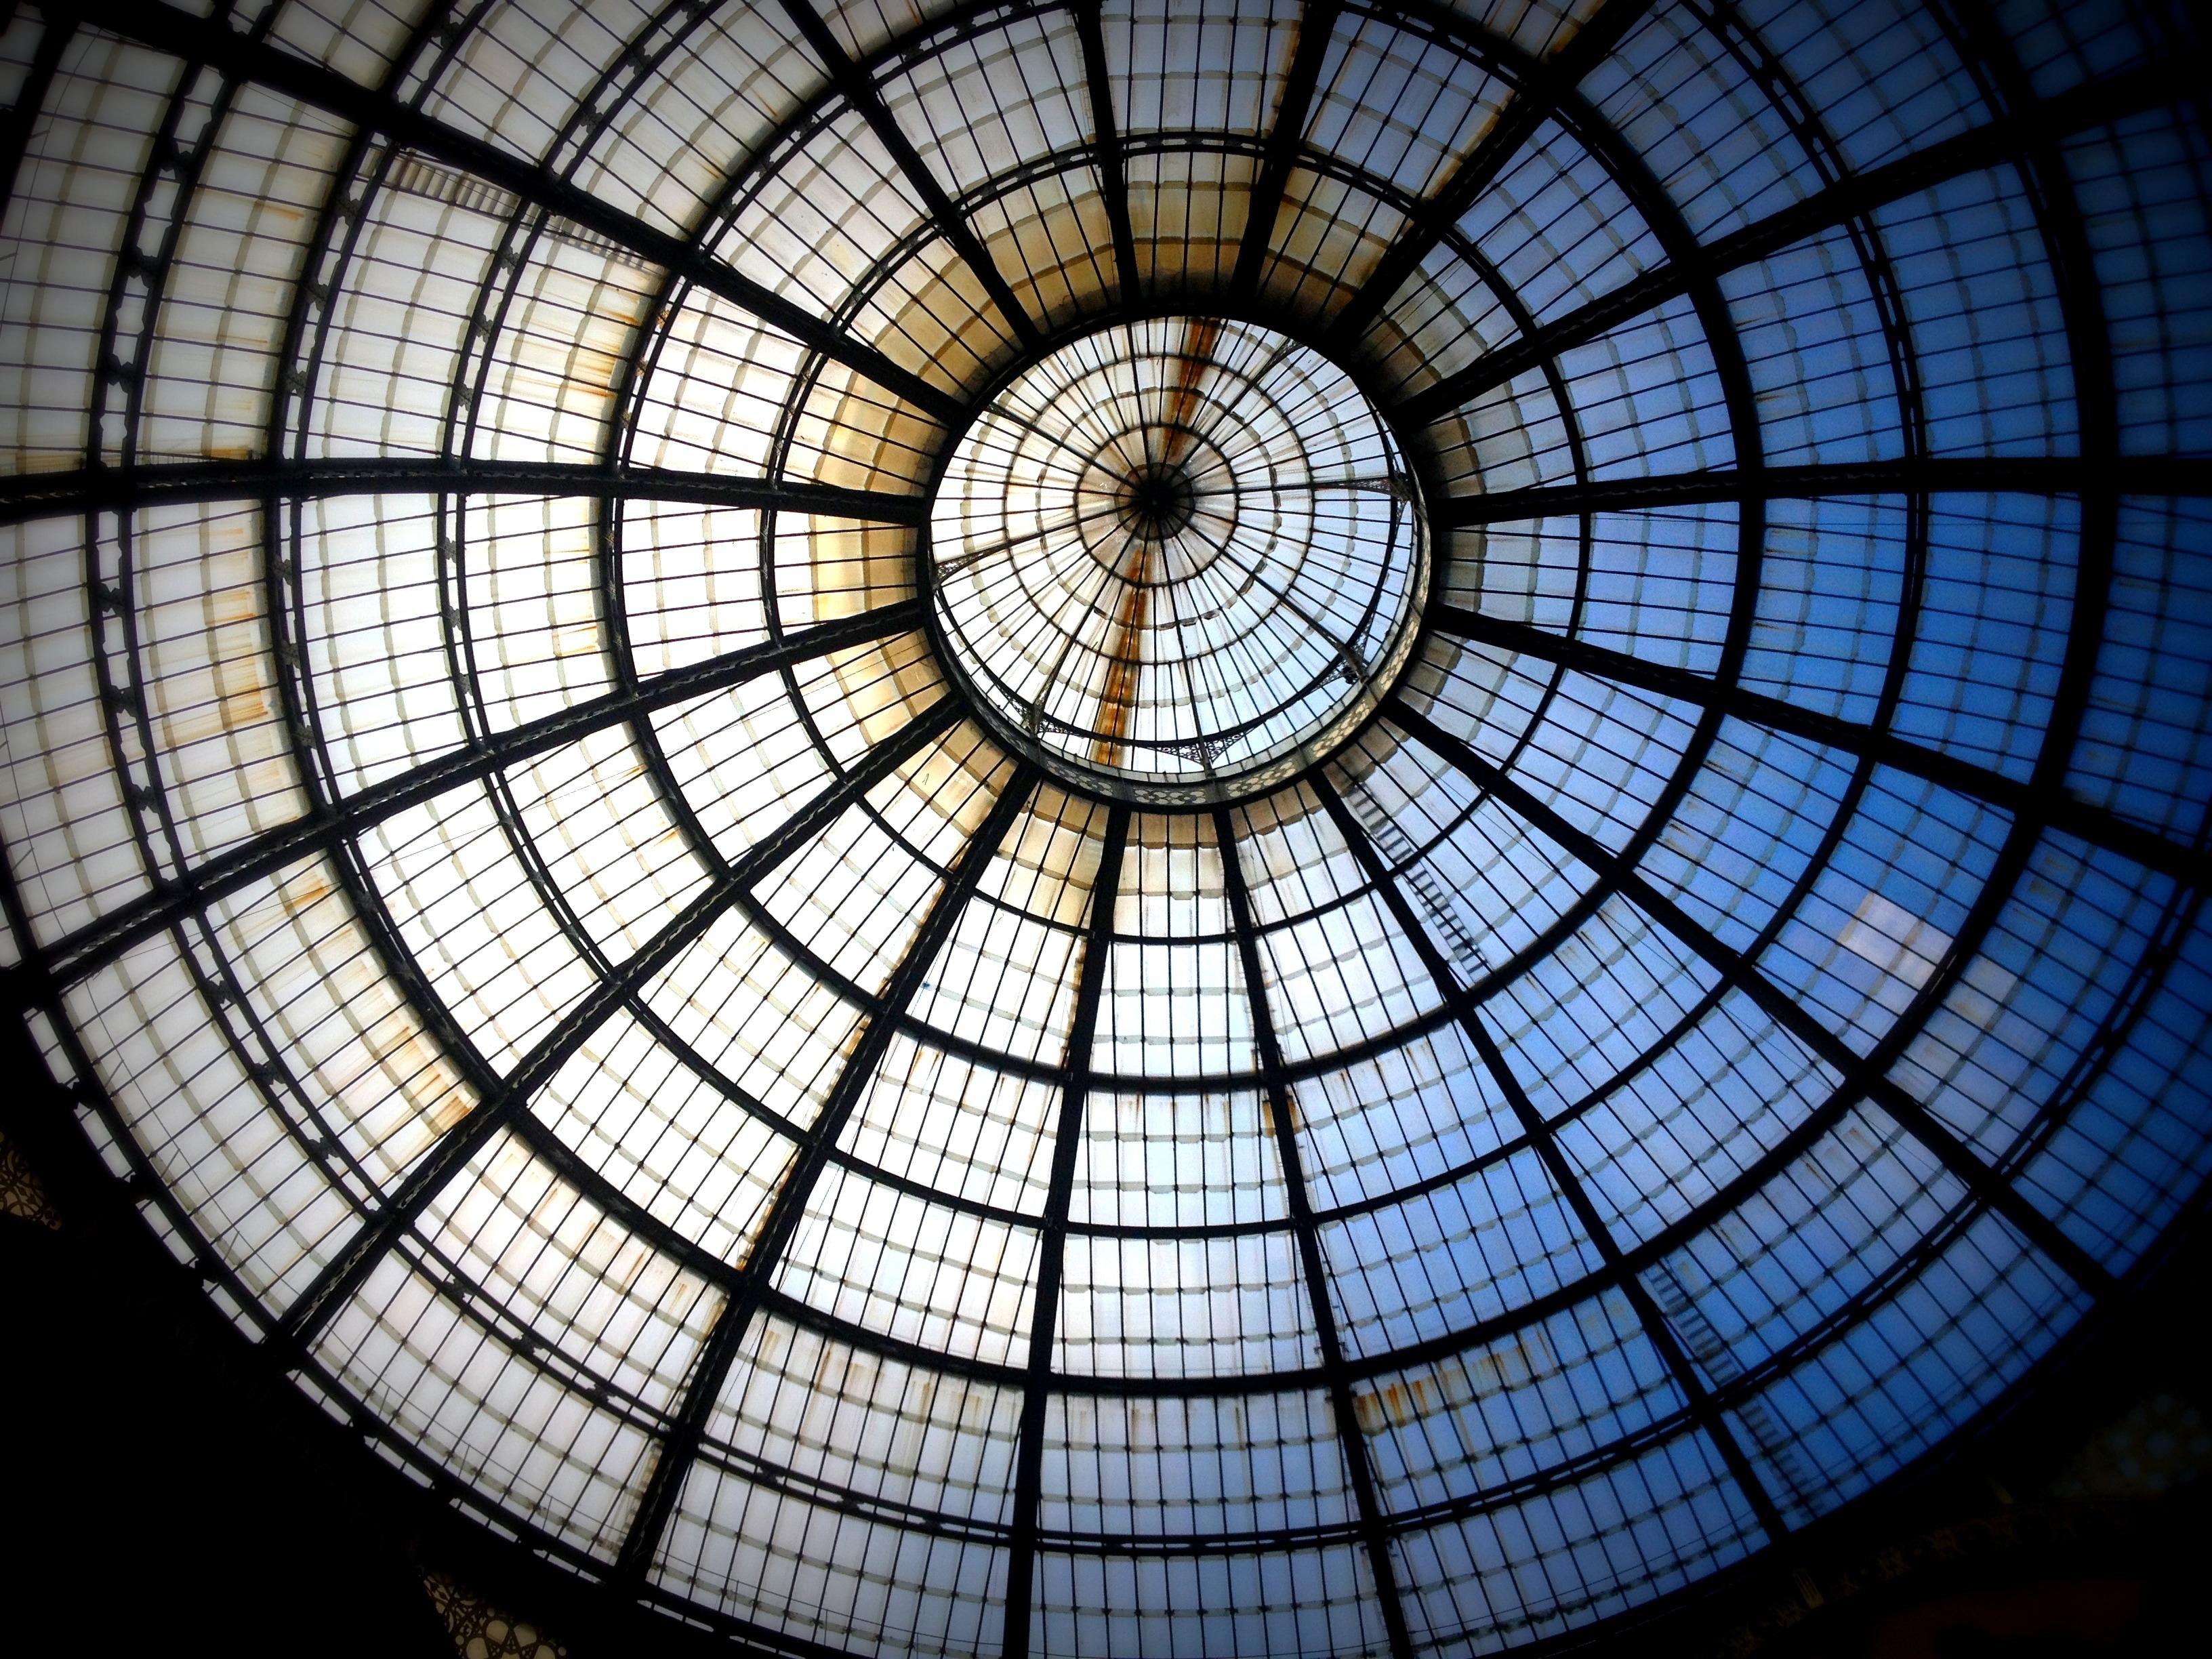 Fotos gratis : ligero, arquitectura, redondo, ventana, vaso ...